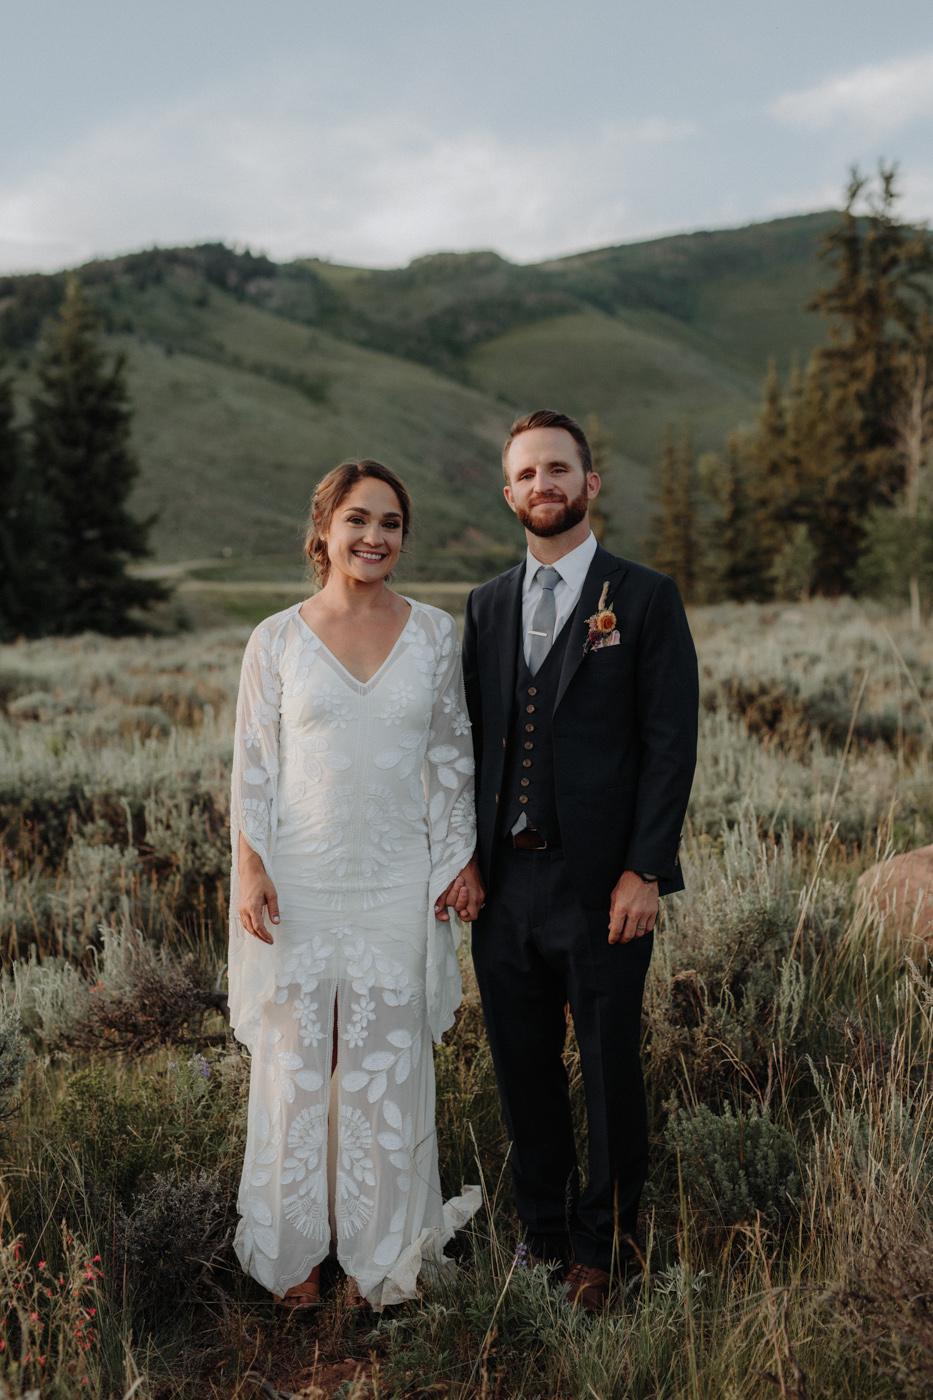 woods-walk-trail-crested-butte-colorado-wedding-129.jpg